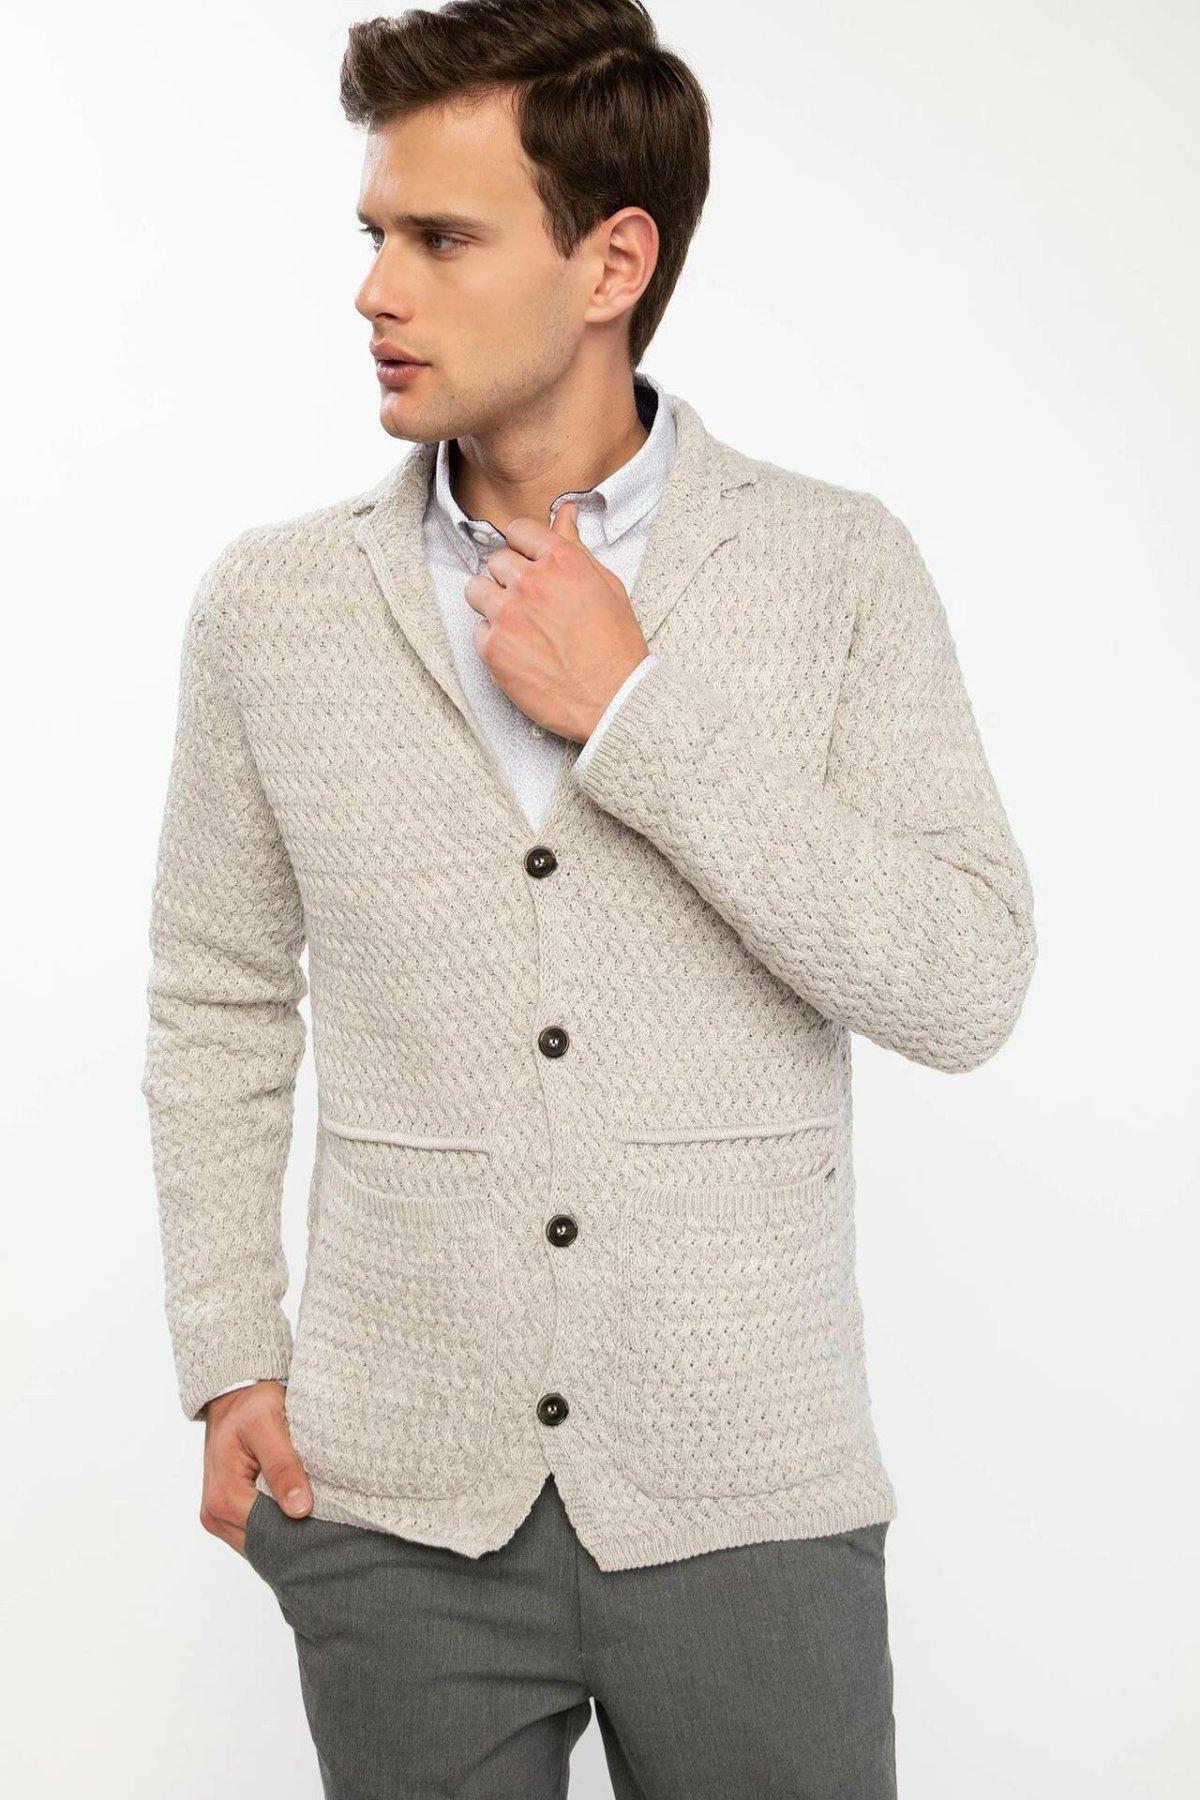 DeFacto Man Beige Knitted Cardigan Coats Men Winter Casual Long Sleeve Top Cardigans Male Tops / Bolero-J3400AZ18WN